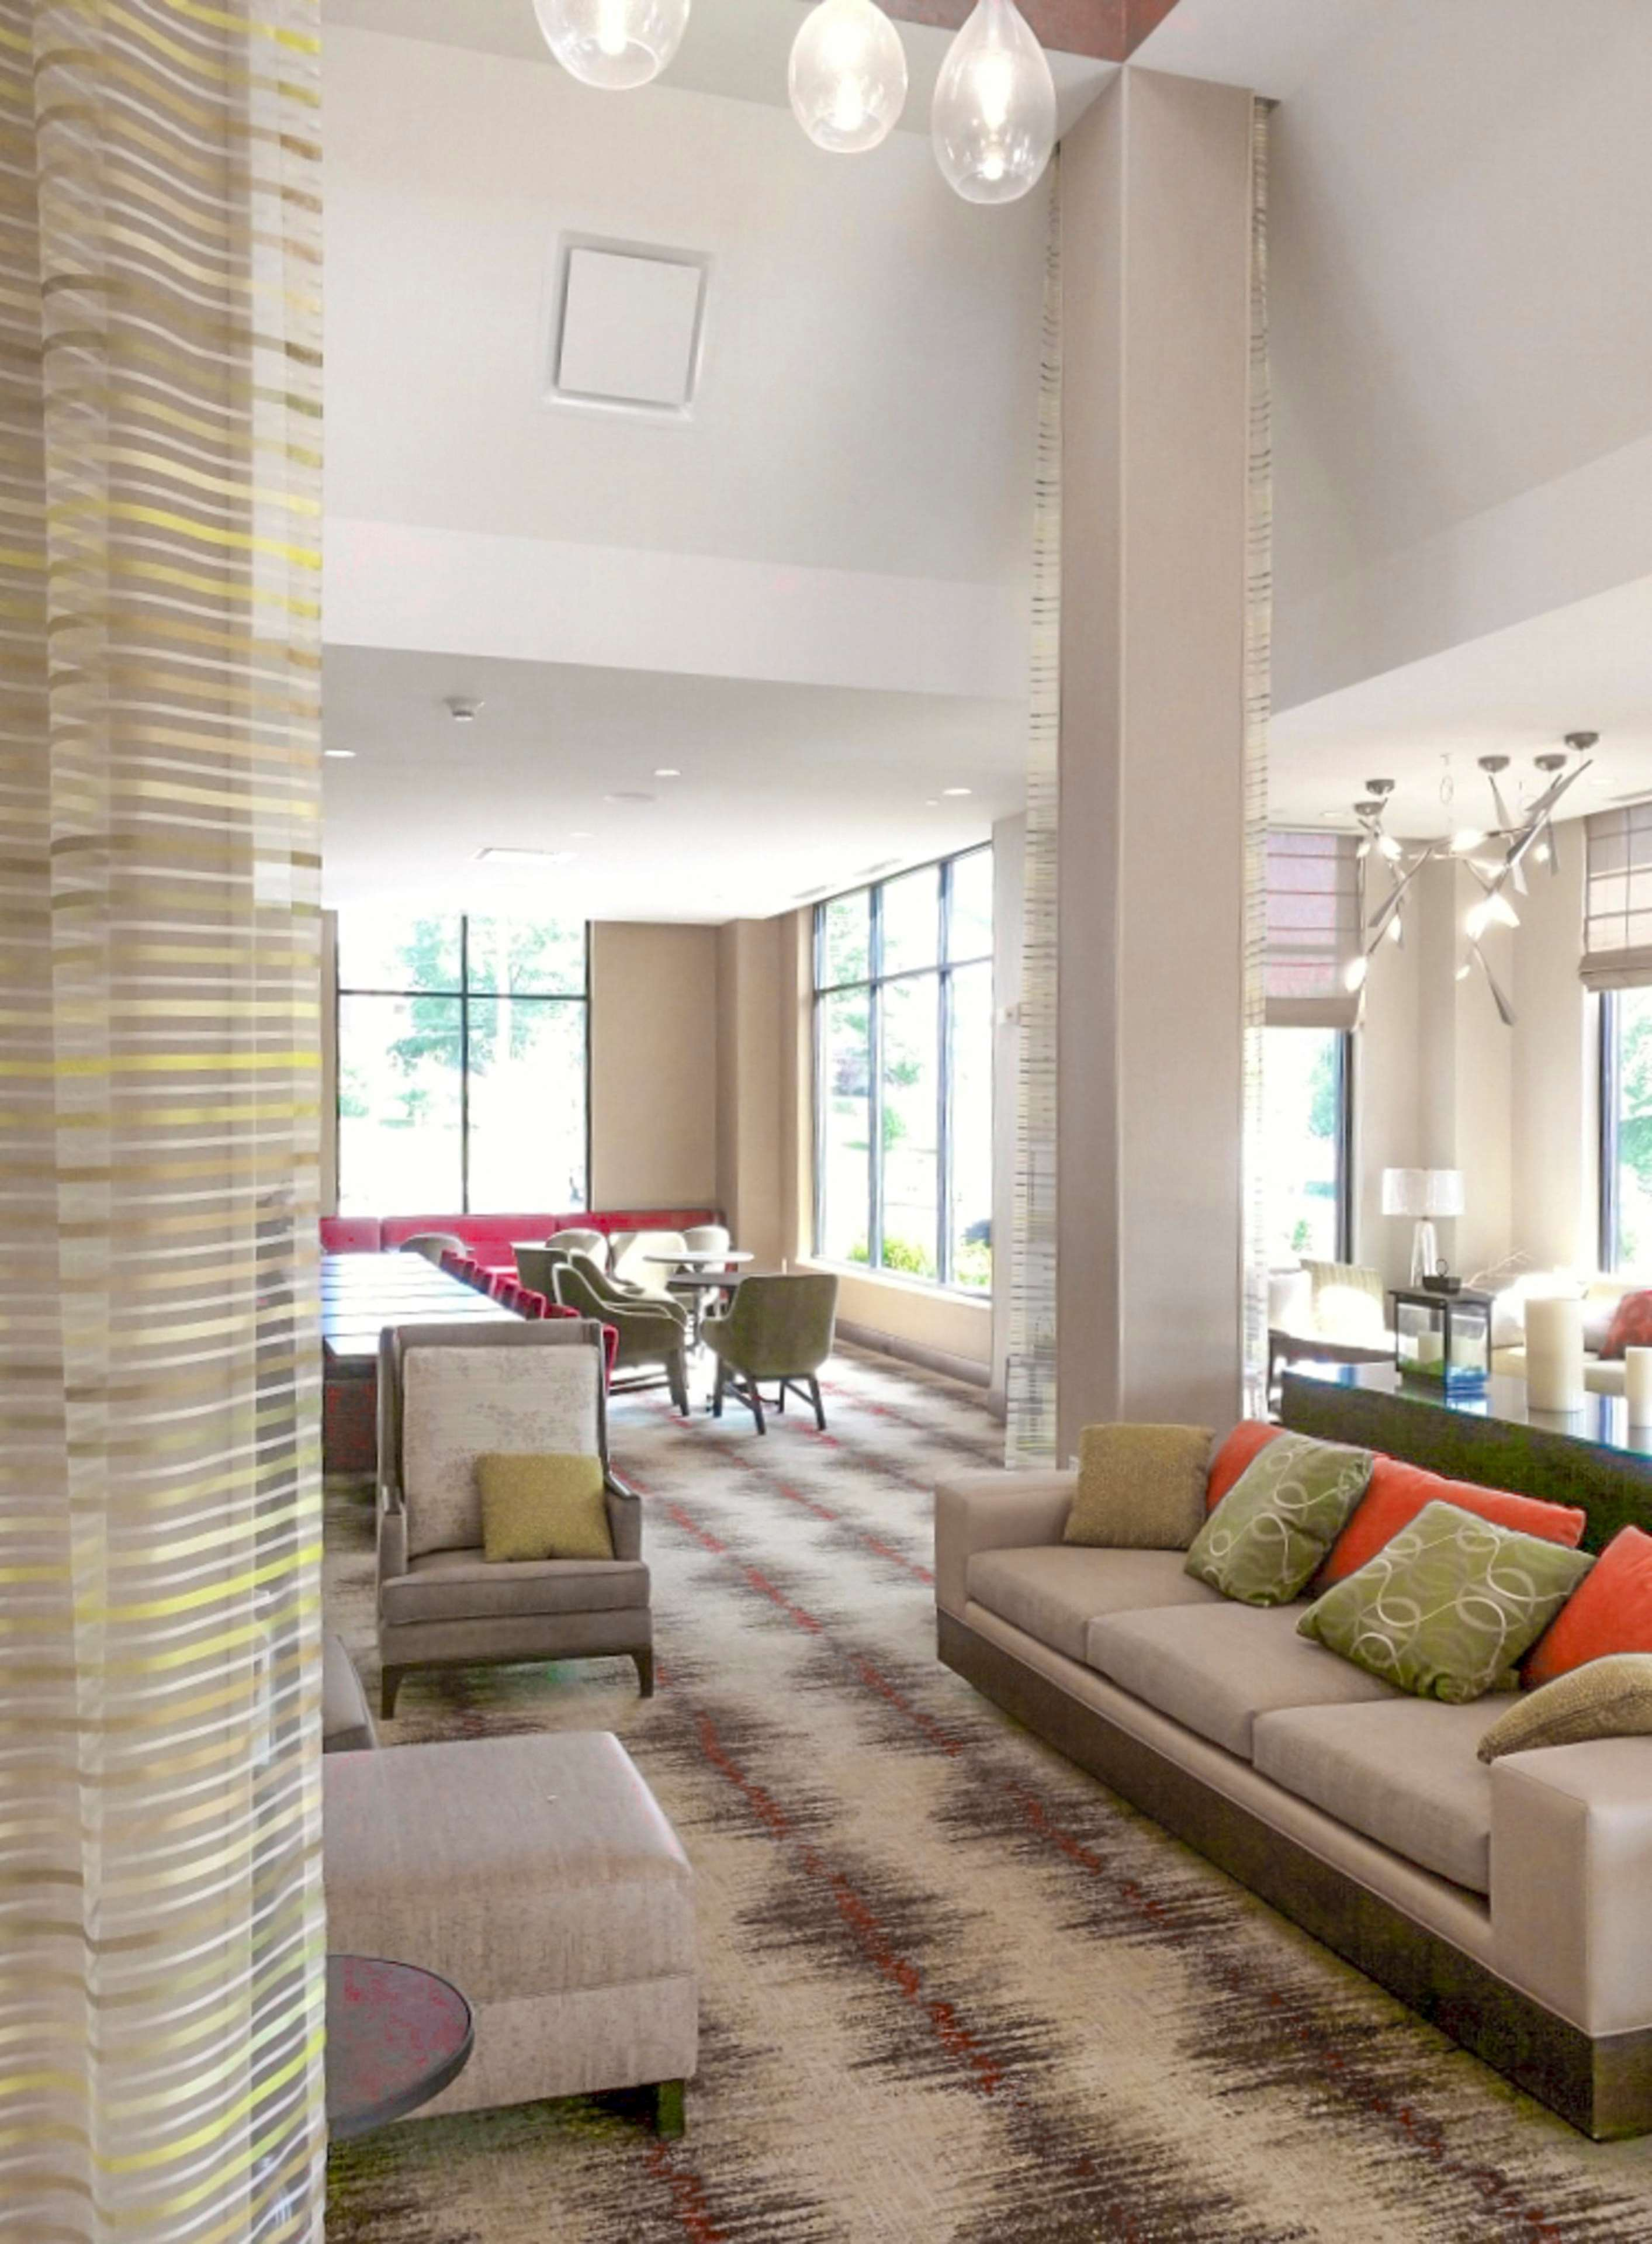 Hilton Garden Inn Boston/Marlborough image 22